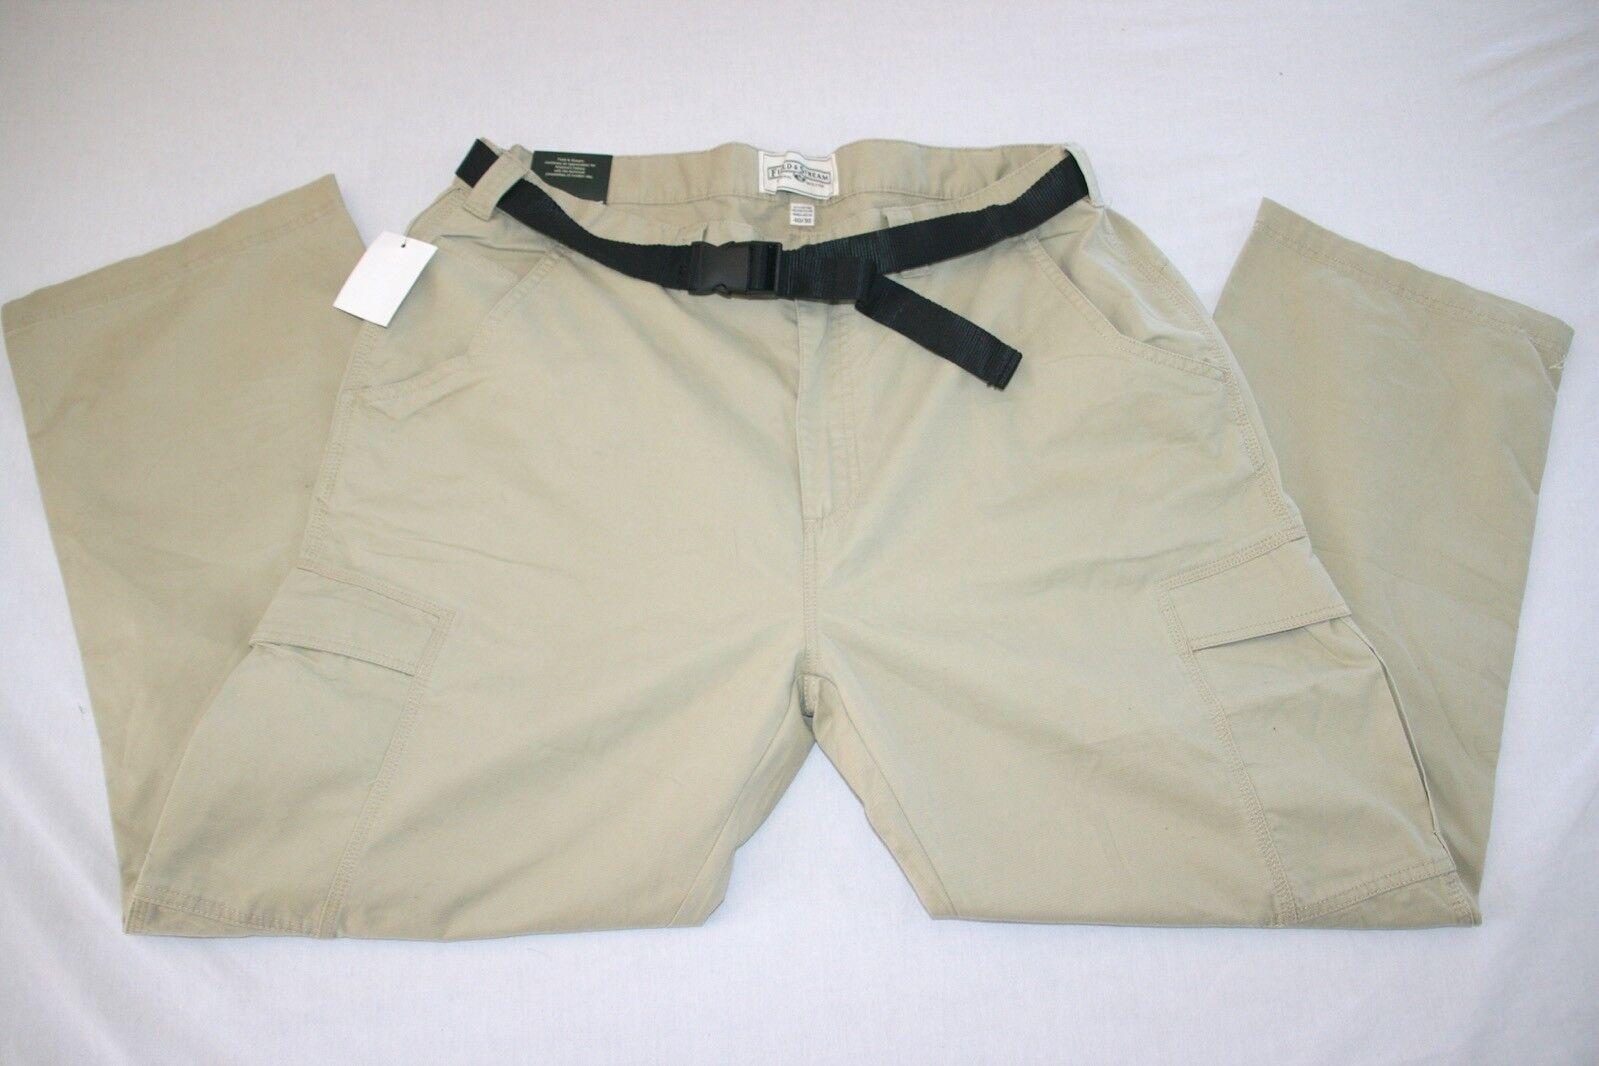 Field & Stream Adventurer Cargo Pant Men 40x30 Beige NEW